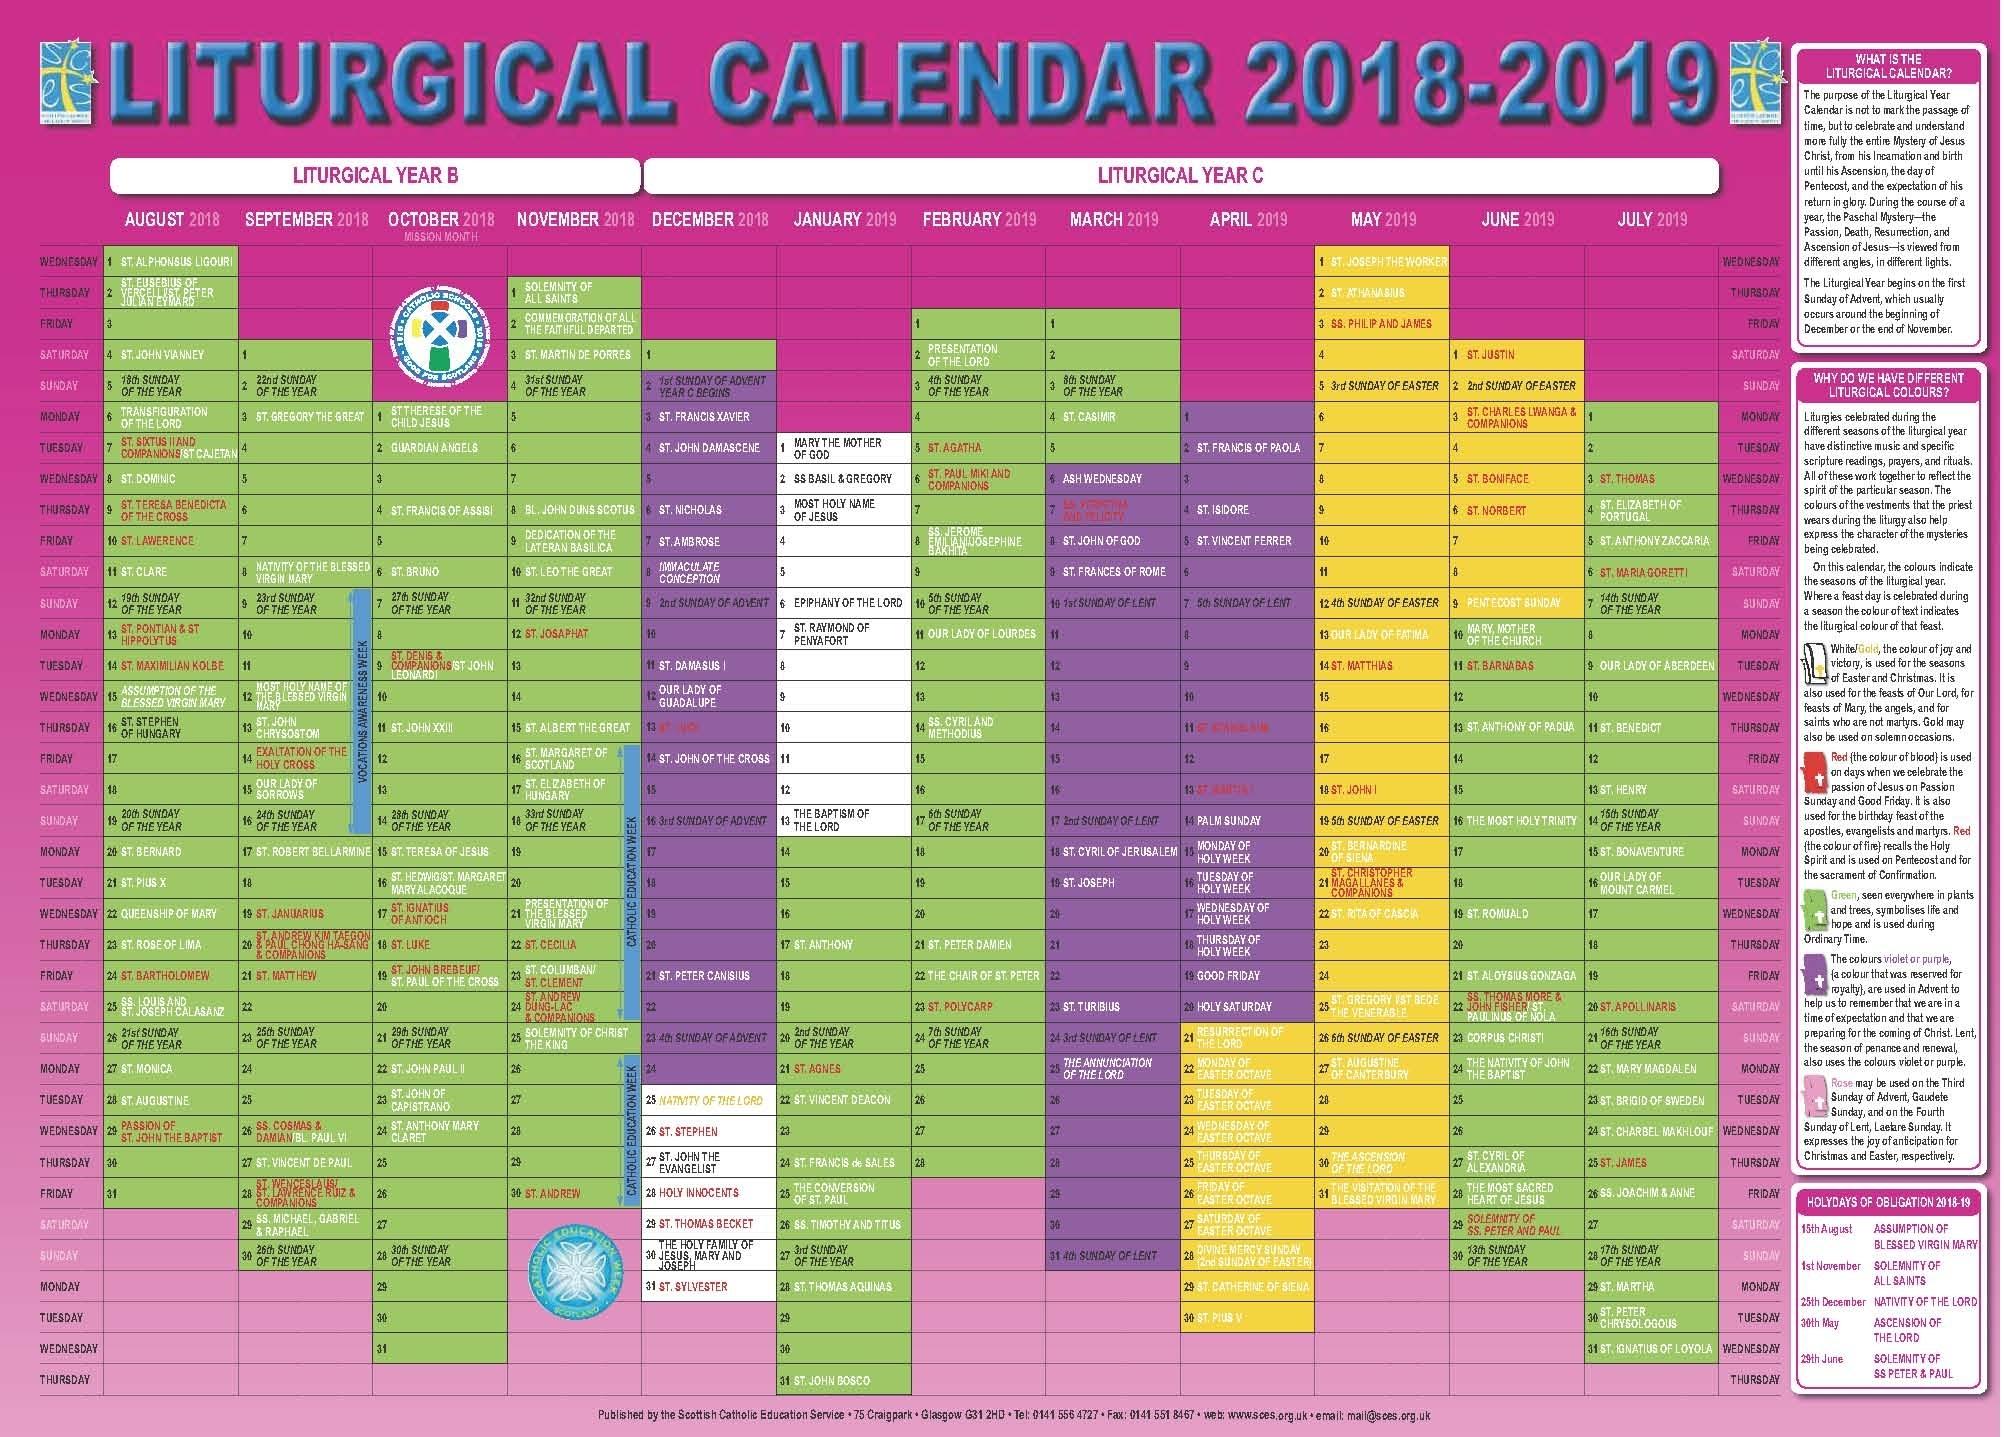 Scottish Catholic Education Service | Sces | Liturgical regarding Liturgical Calendar 2019 2020 Catholic